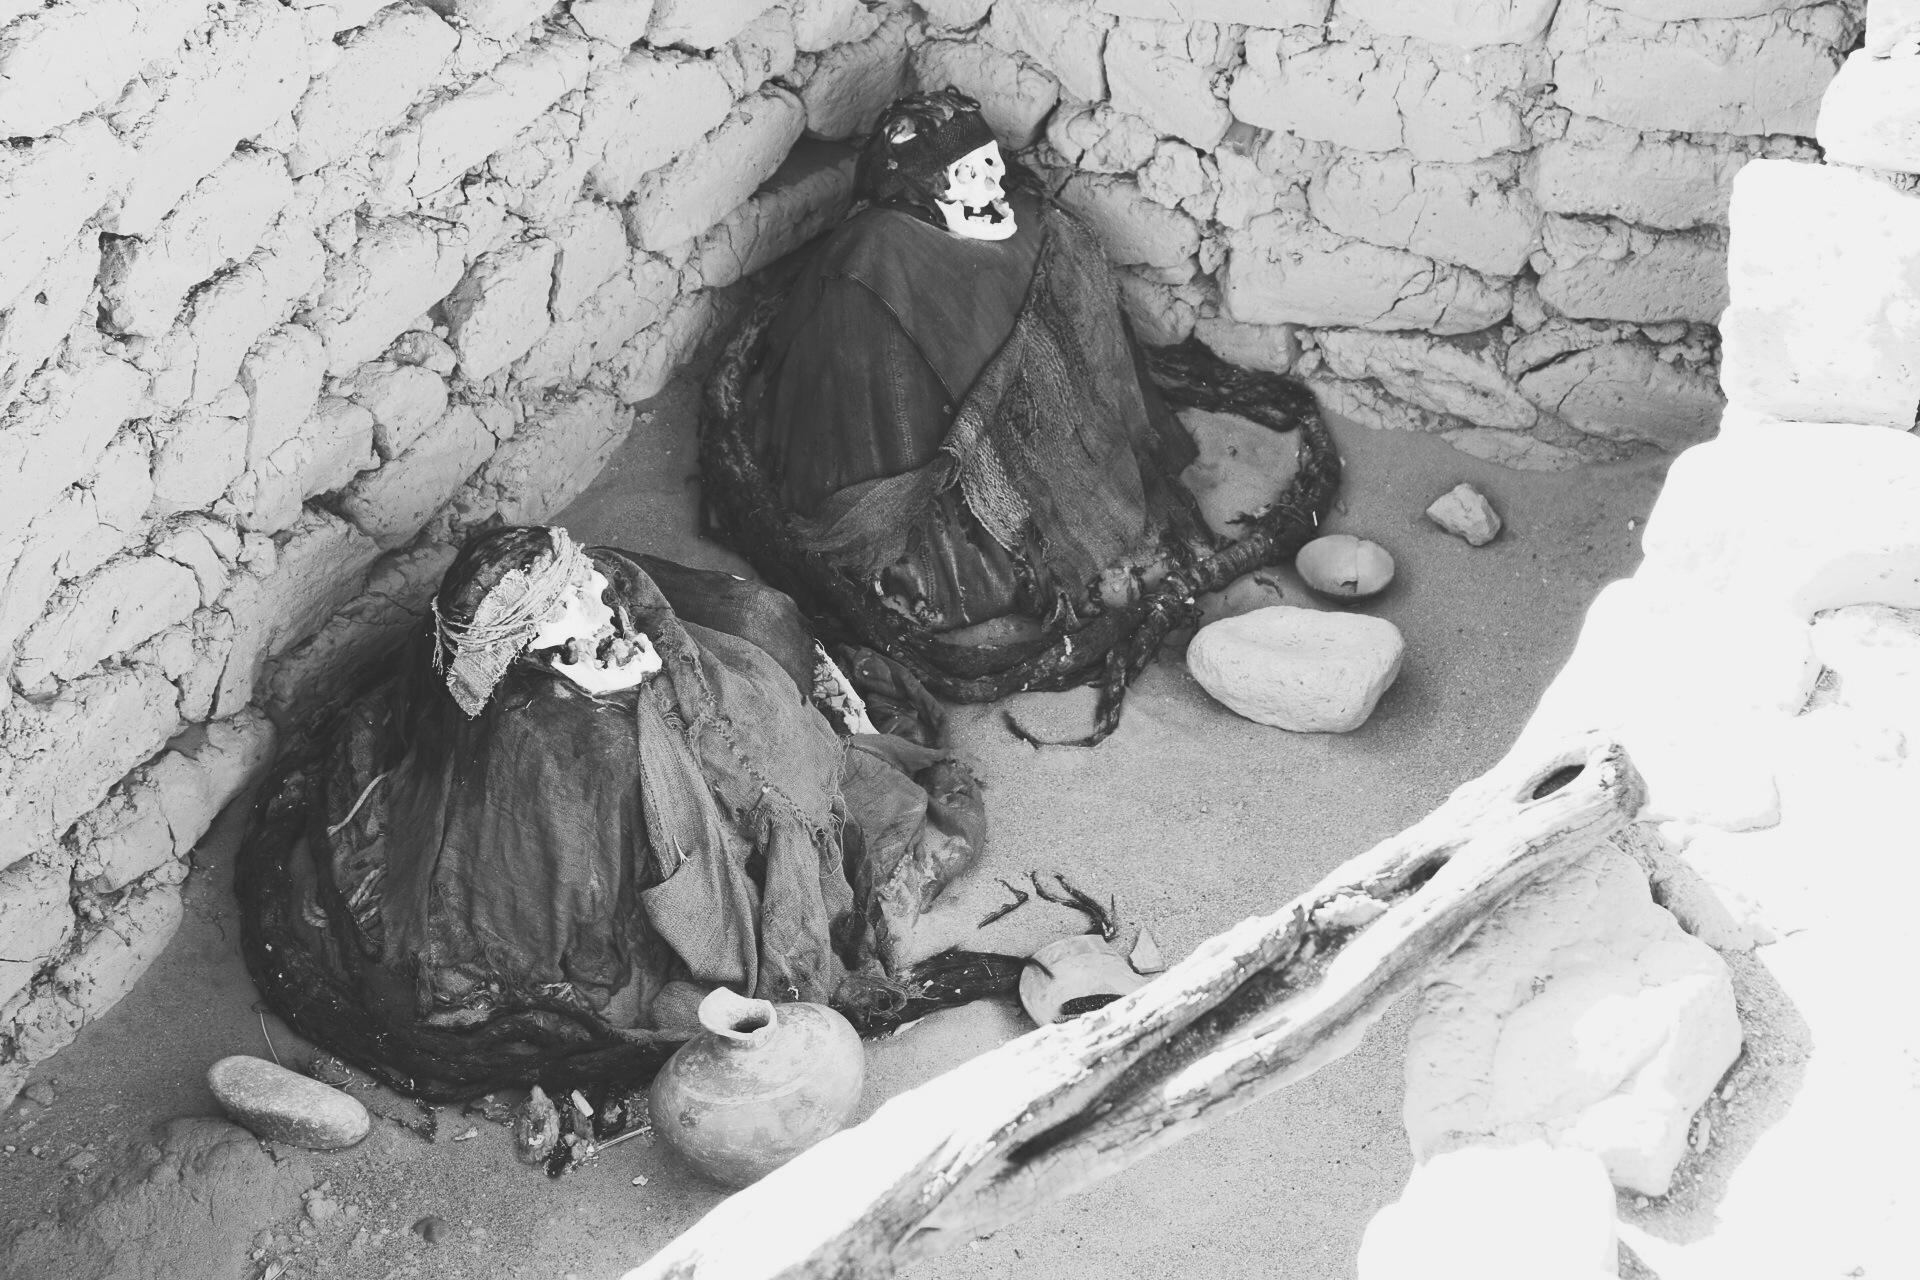 Mummies at the Chauchilla Cemetery